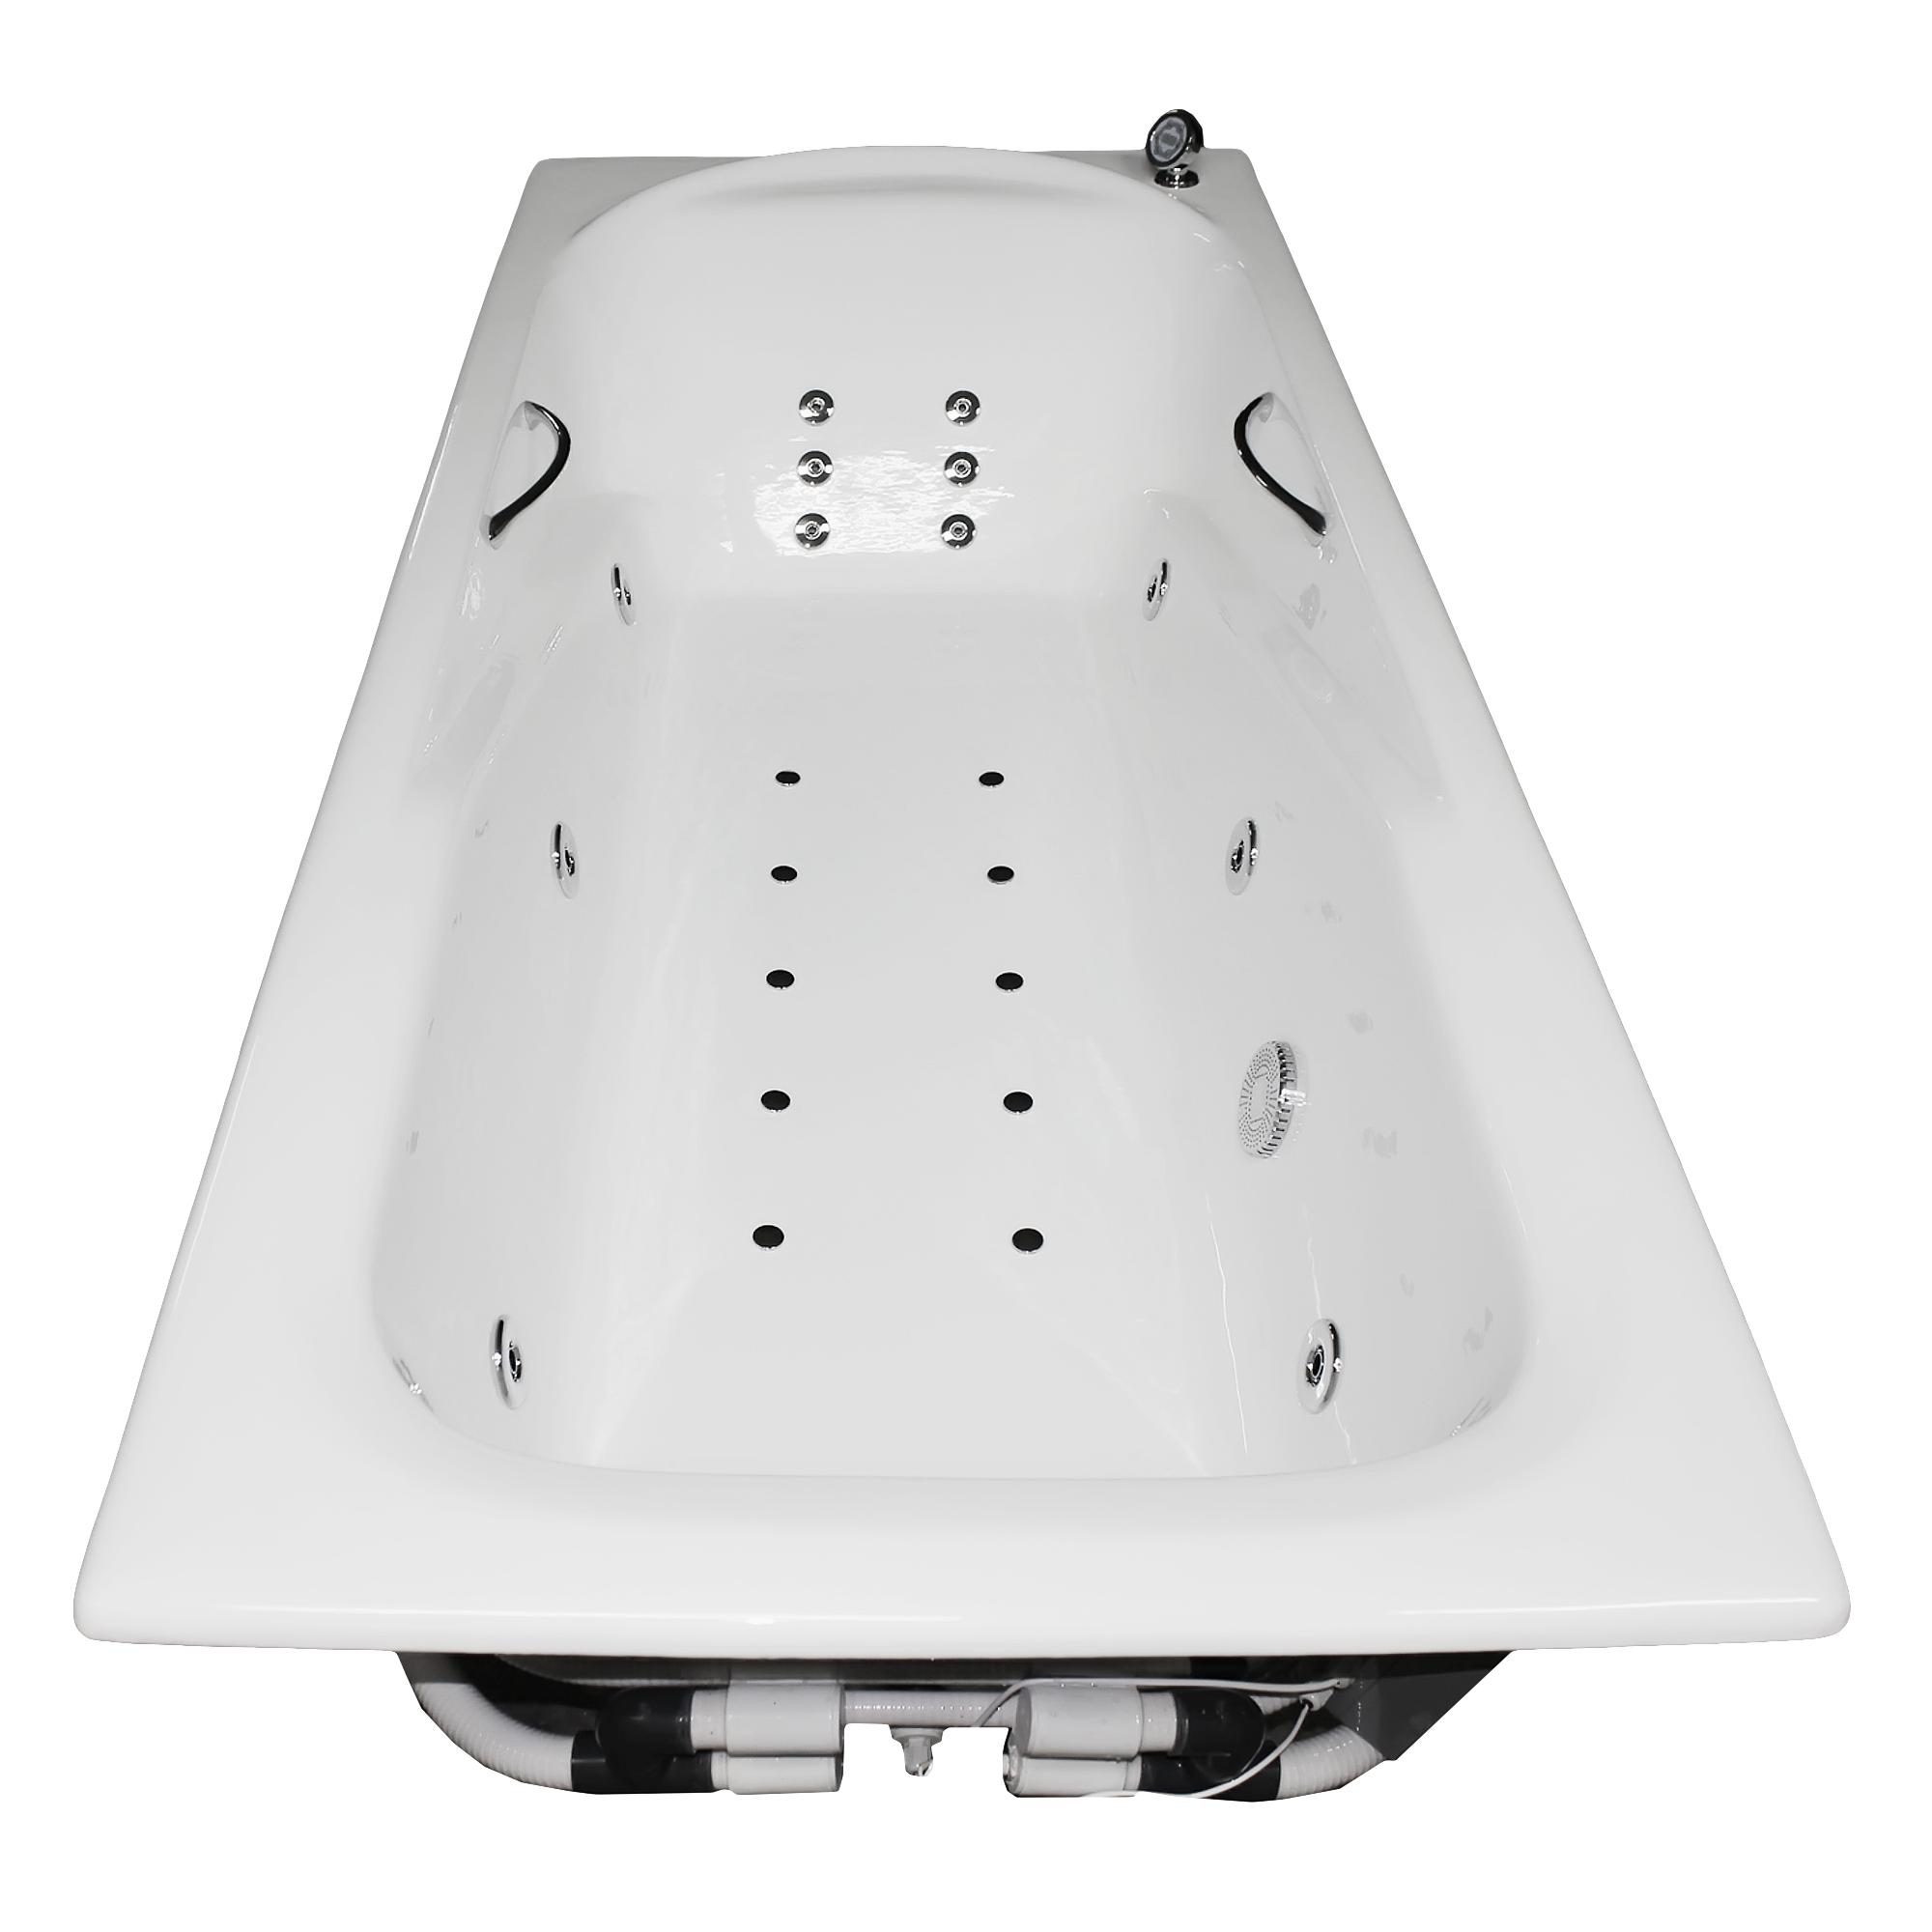 Ванна Artex Grande 200x85